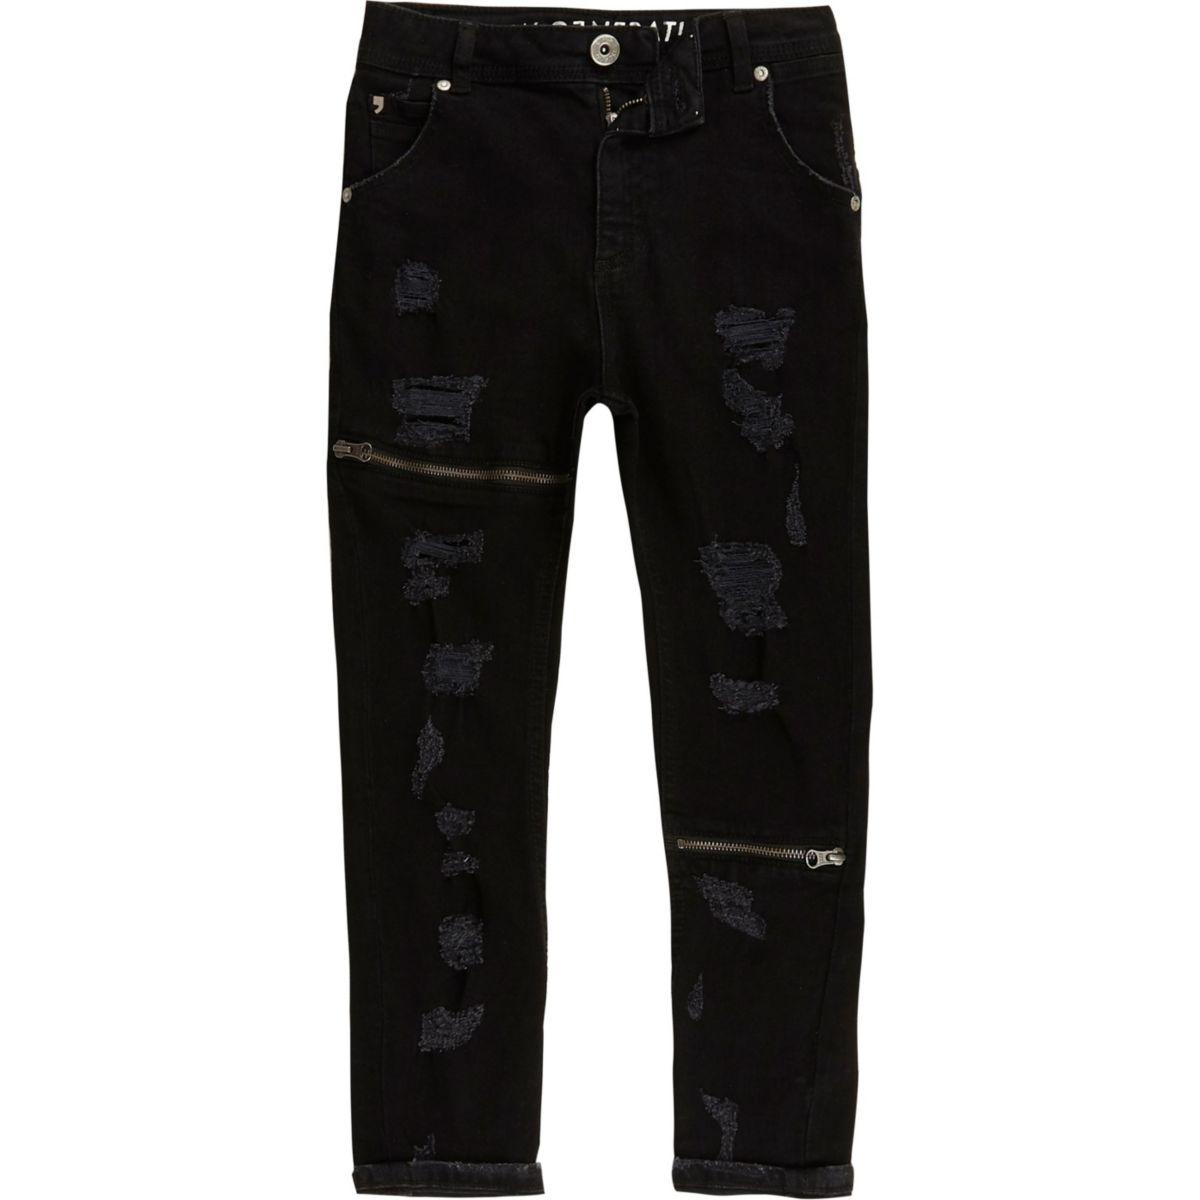 ri studio tony jean large noir d chir pour enfant denim promo fille. Black Bedroom Furniture Sets. Home Design Ideas